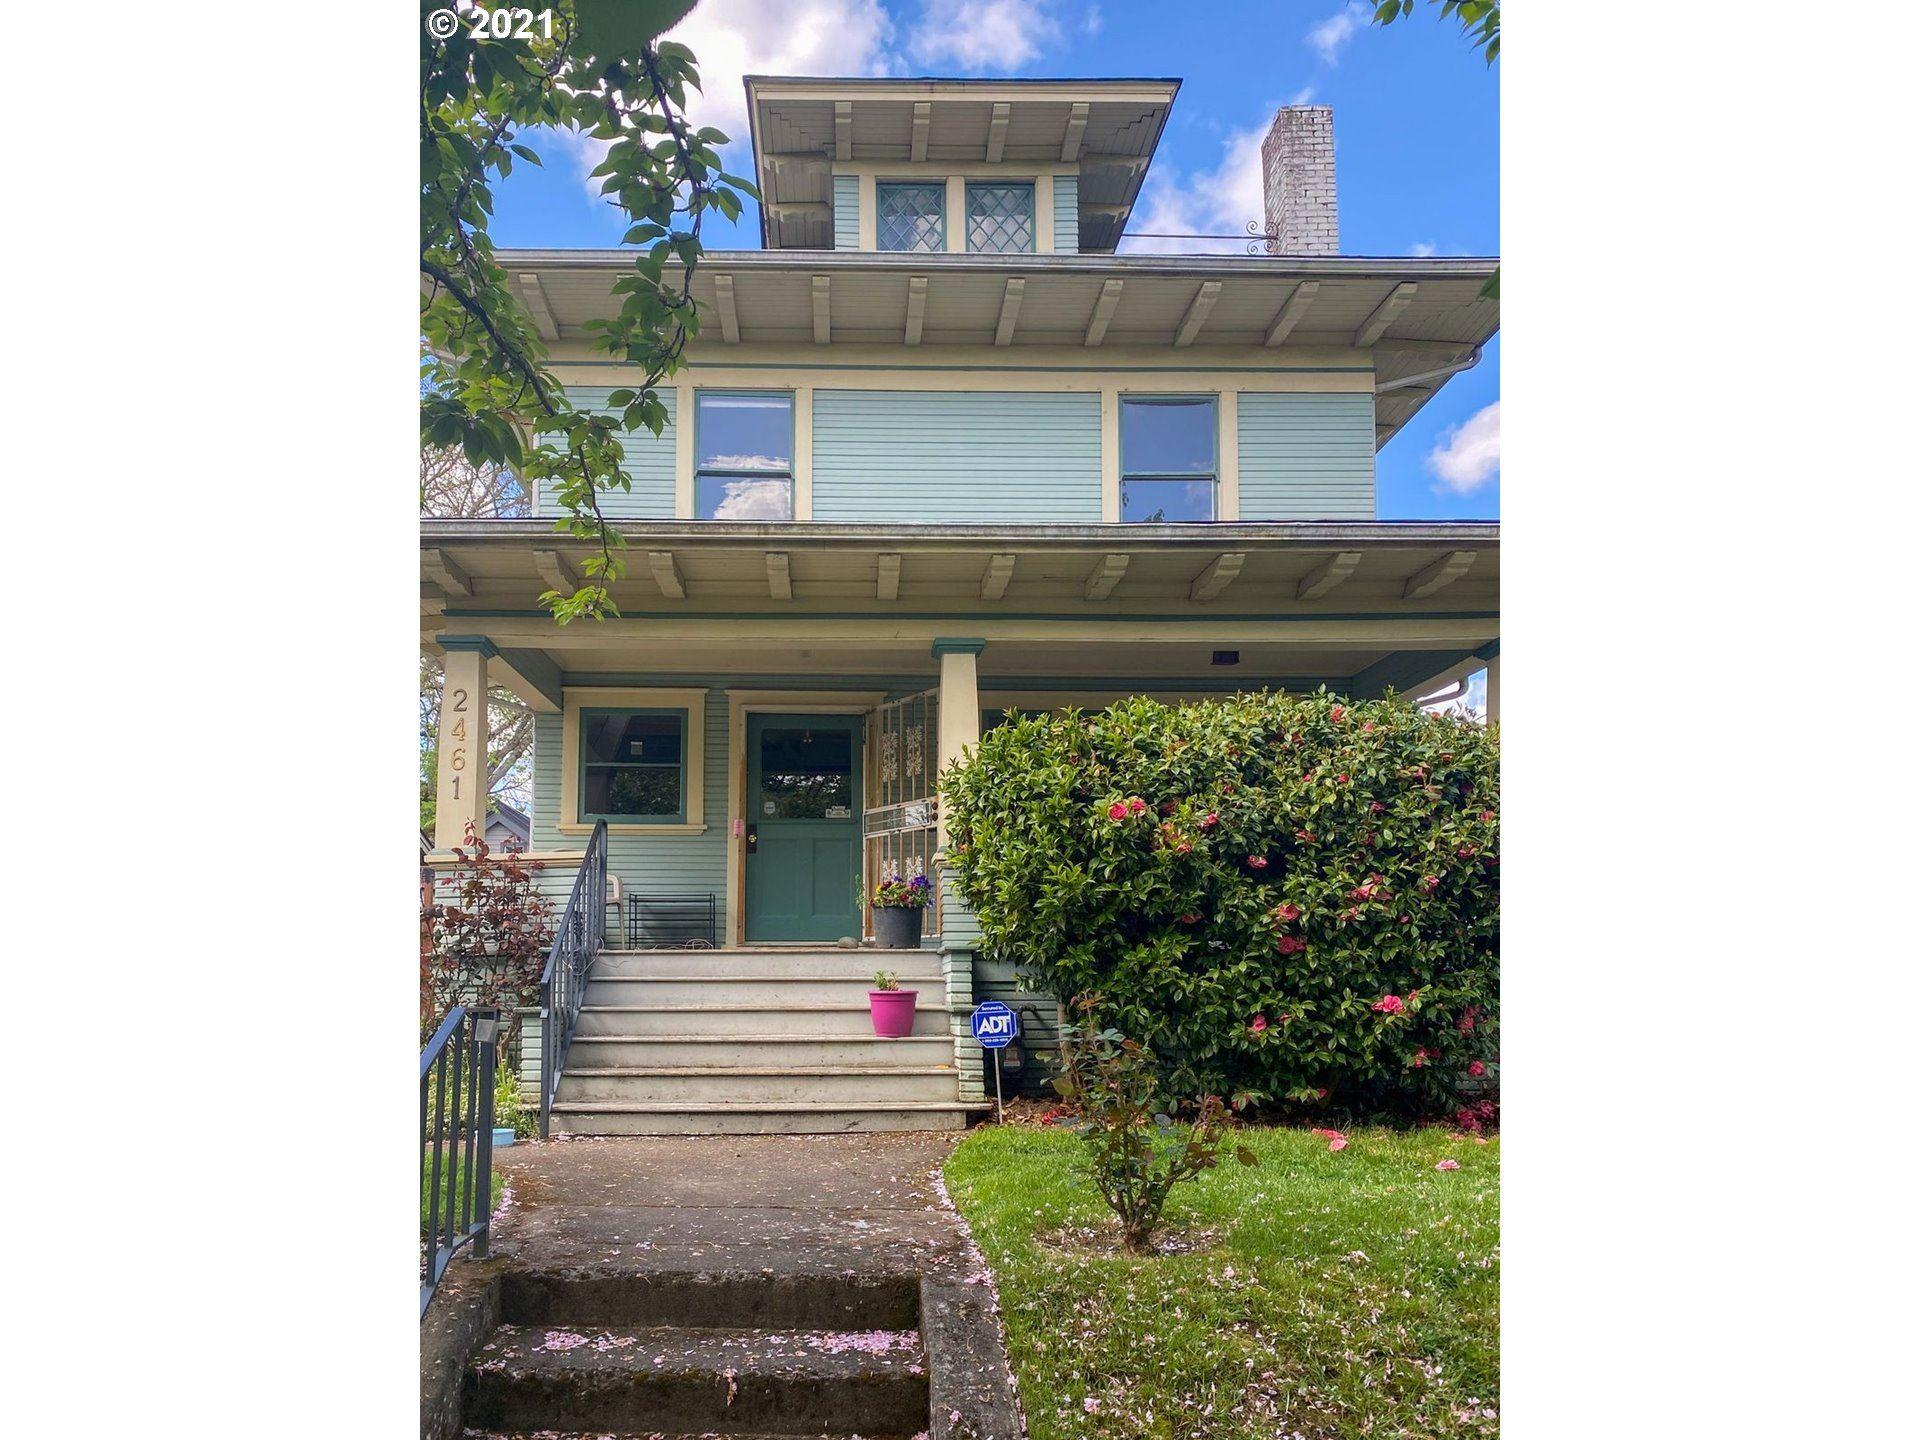 2461 NE 60TH AVE, Portland, OR 97213 - MLS#: 21168330